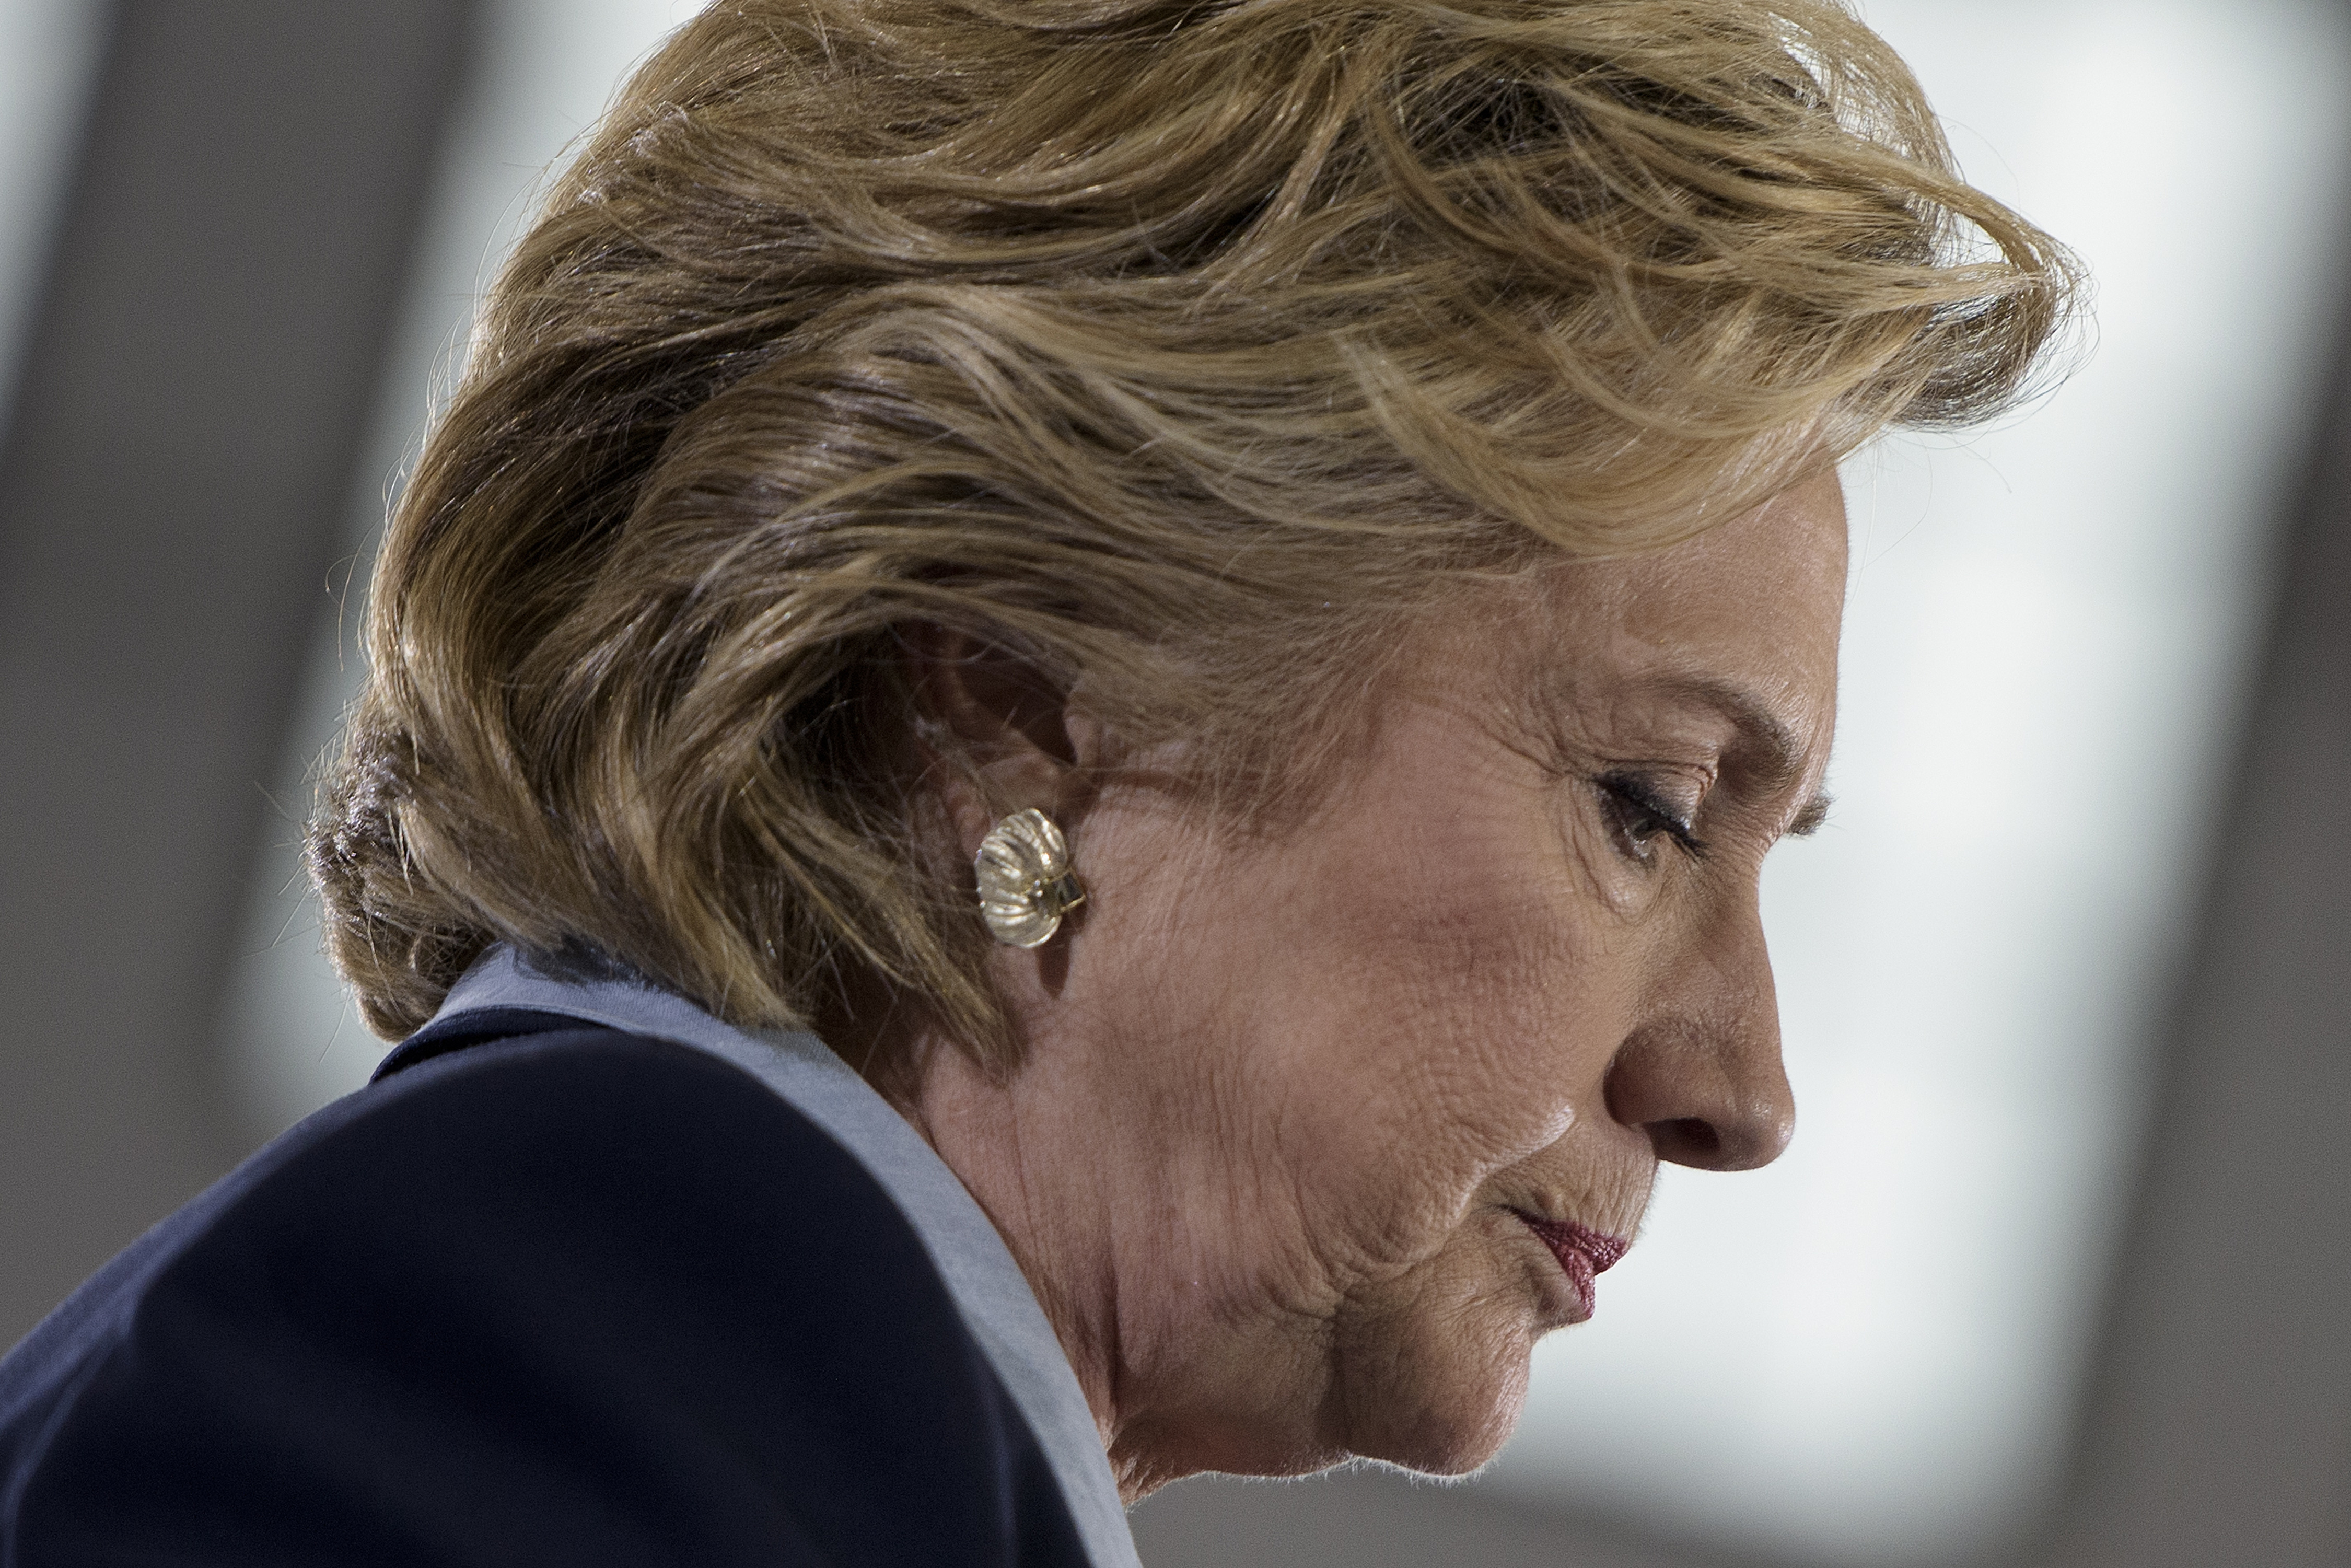 Clinton Foundation, Clinton Foundation hacked, Guccifer 2.0, Russia hacking, Hillary Clinton corruption